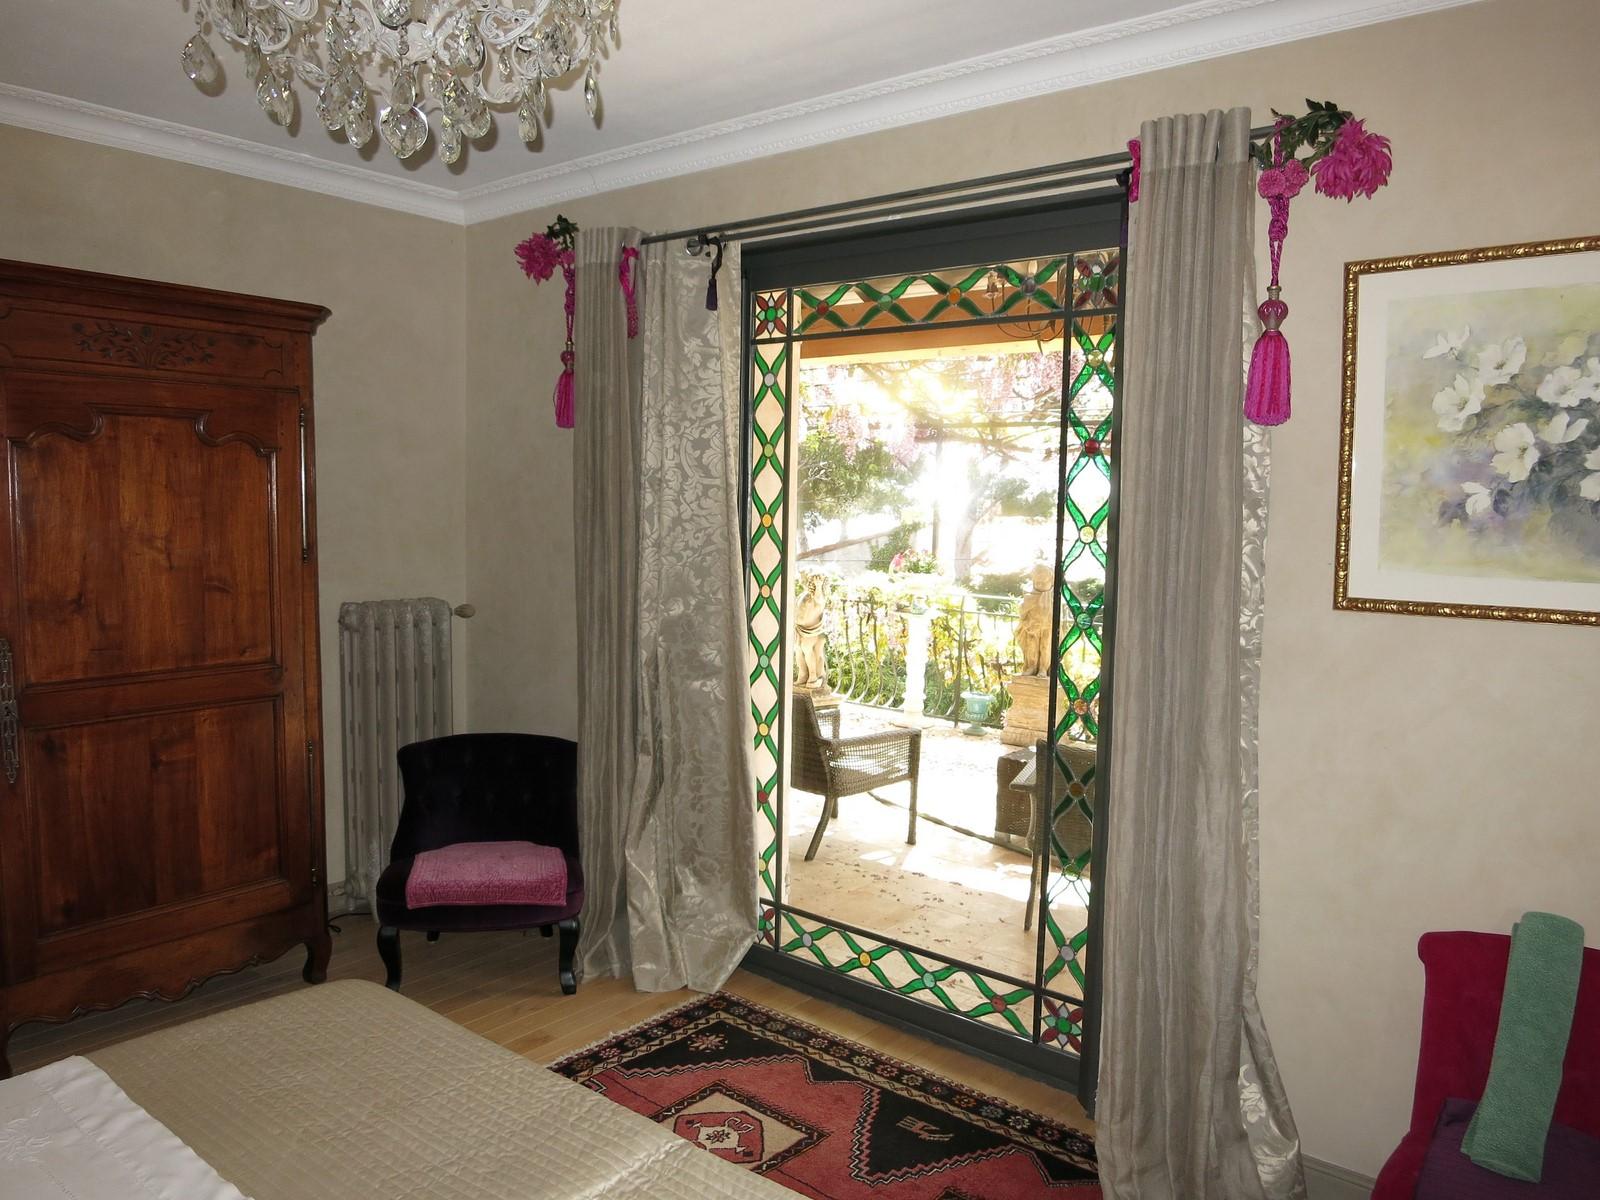 Carry Le Rouet guest house chambres d h´tes et bed&breakfast b&b